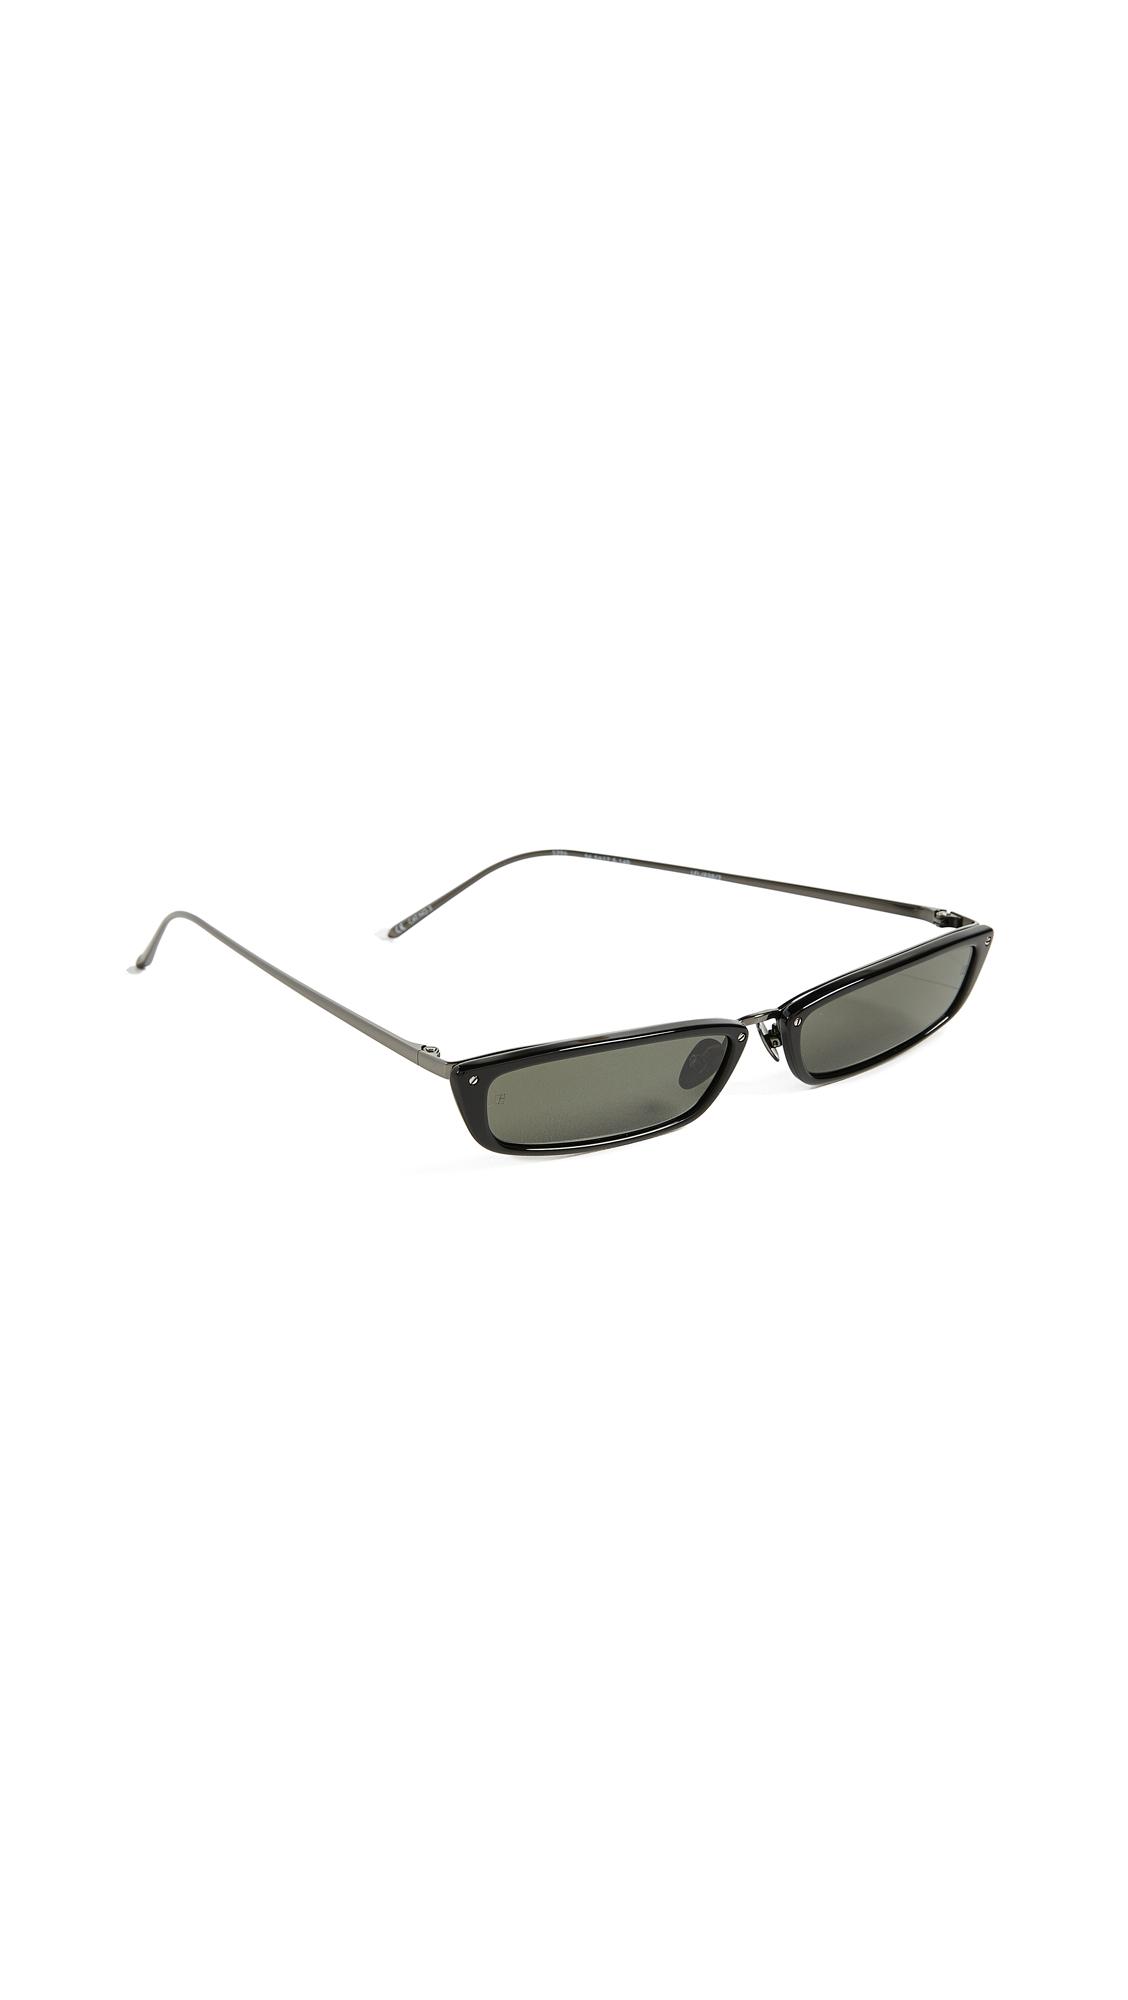 LINDA FARROW LUXE Narrow Rectangular Sunglasses in Black/Grey